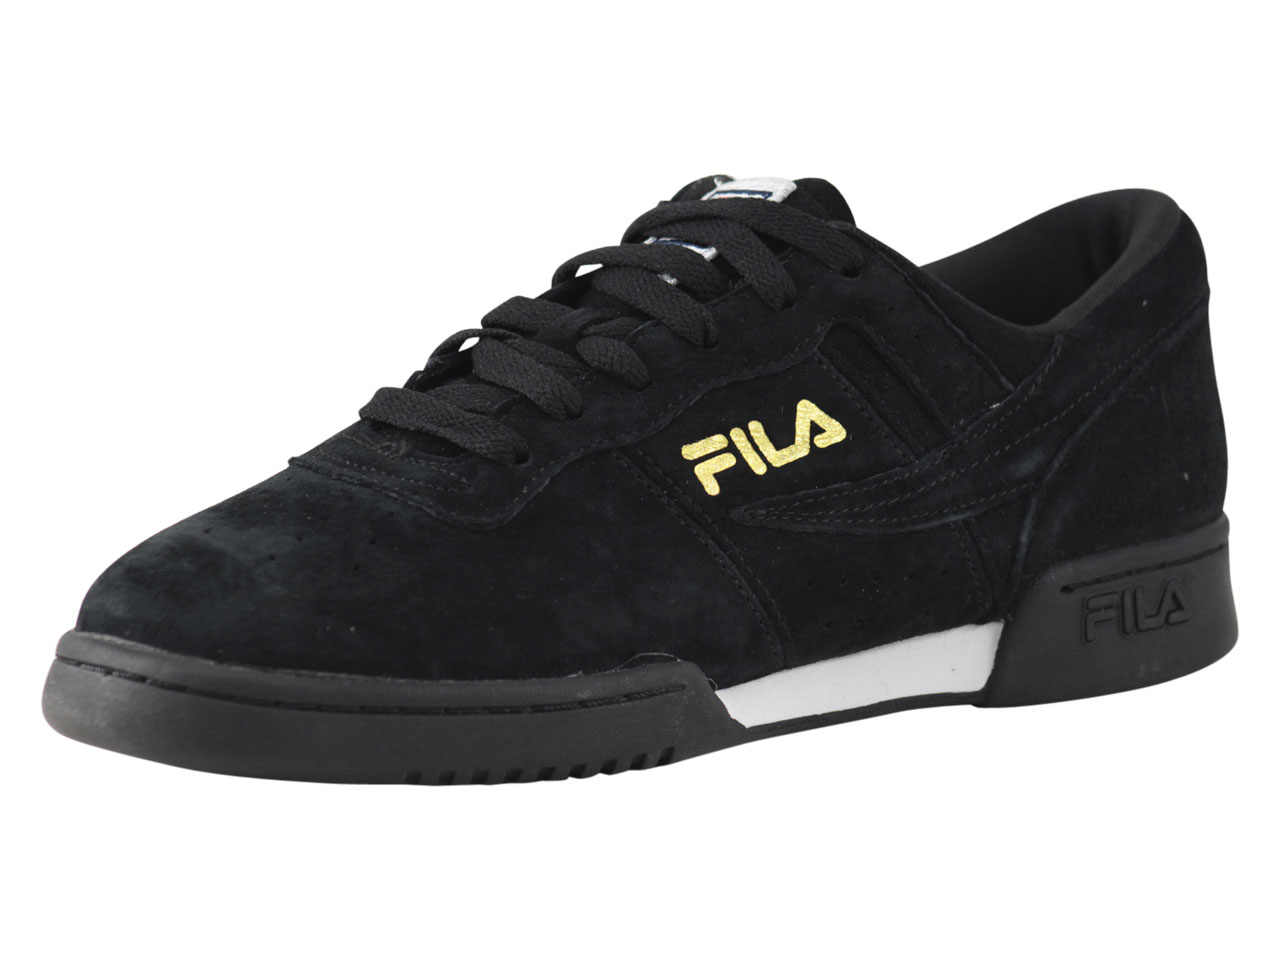 Details about Fila Men's Original Fitness Lineker BlackWhiteMarigold Sneakers Shoes